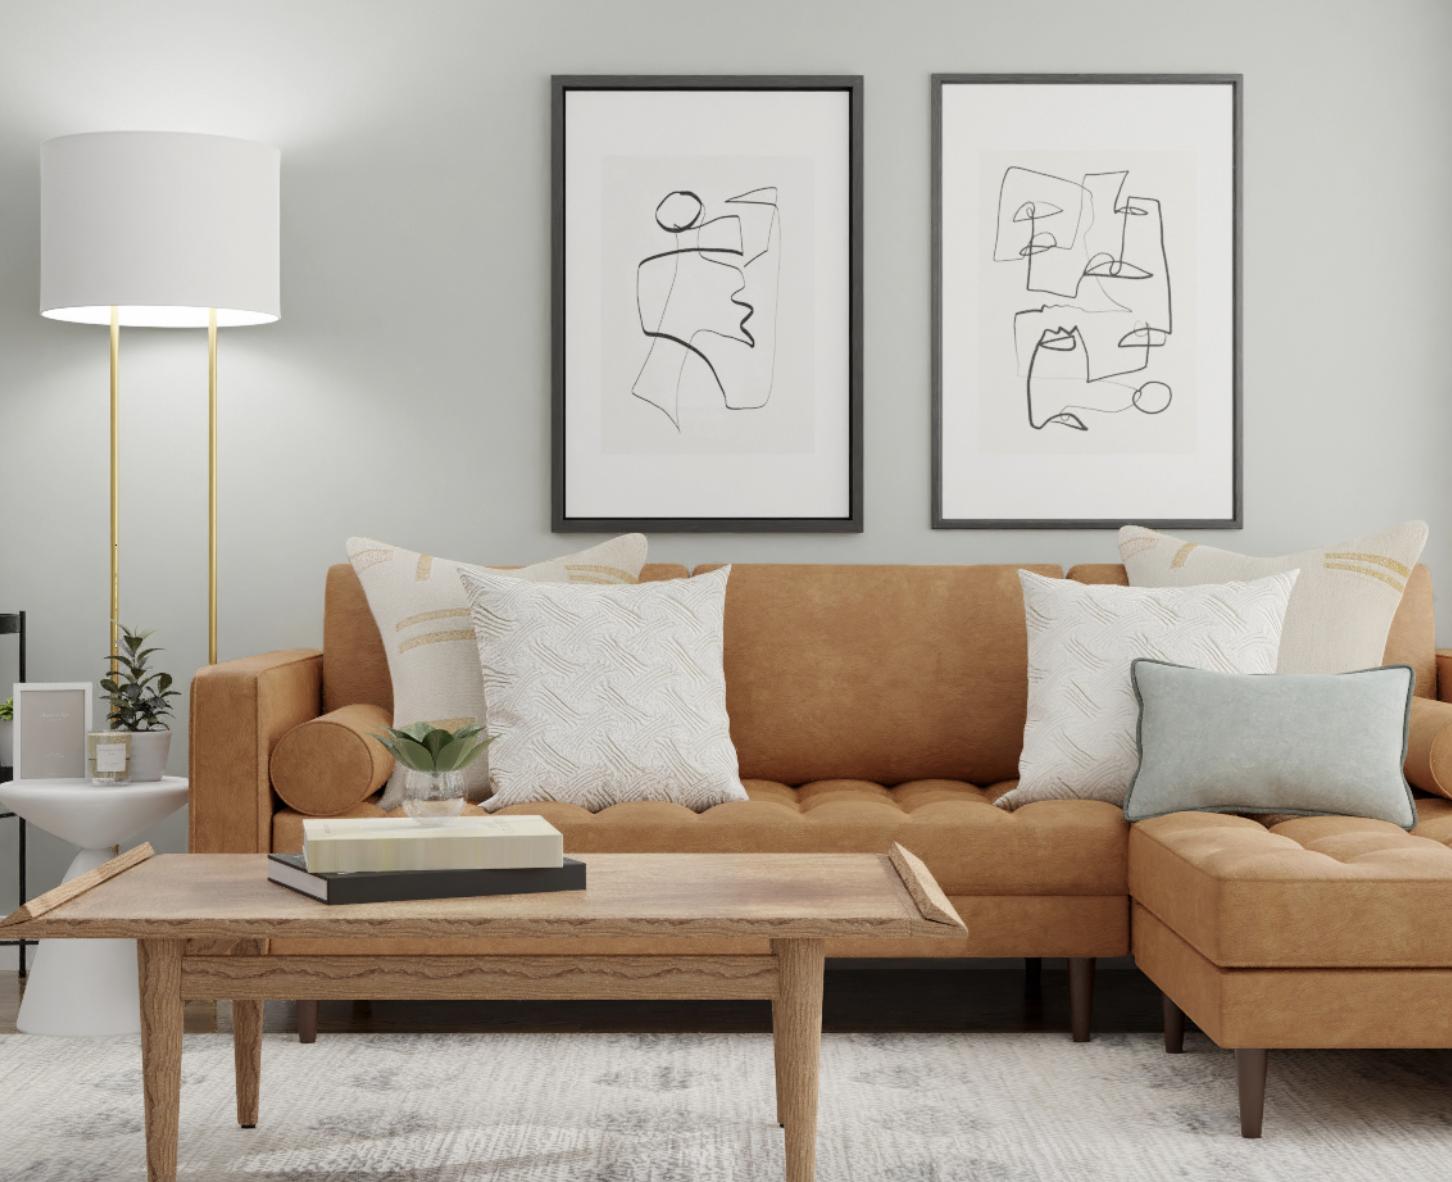 Spacejoy Mid-Century Modern Living Room